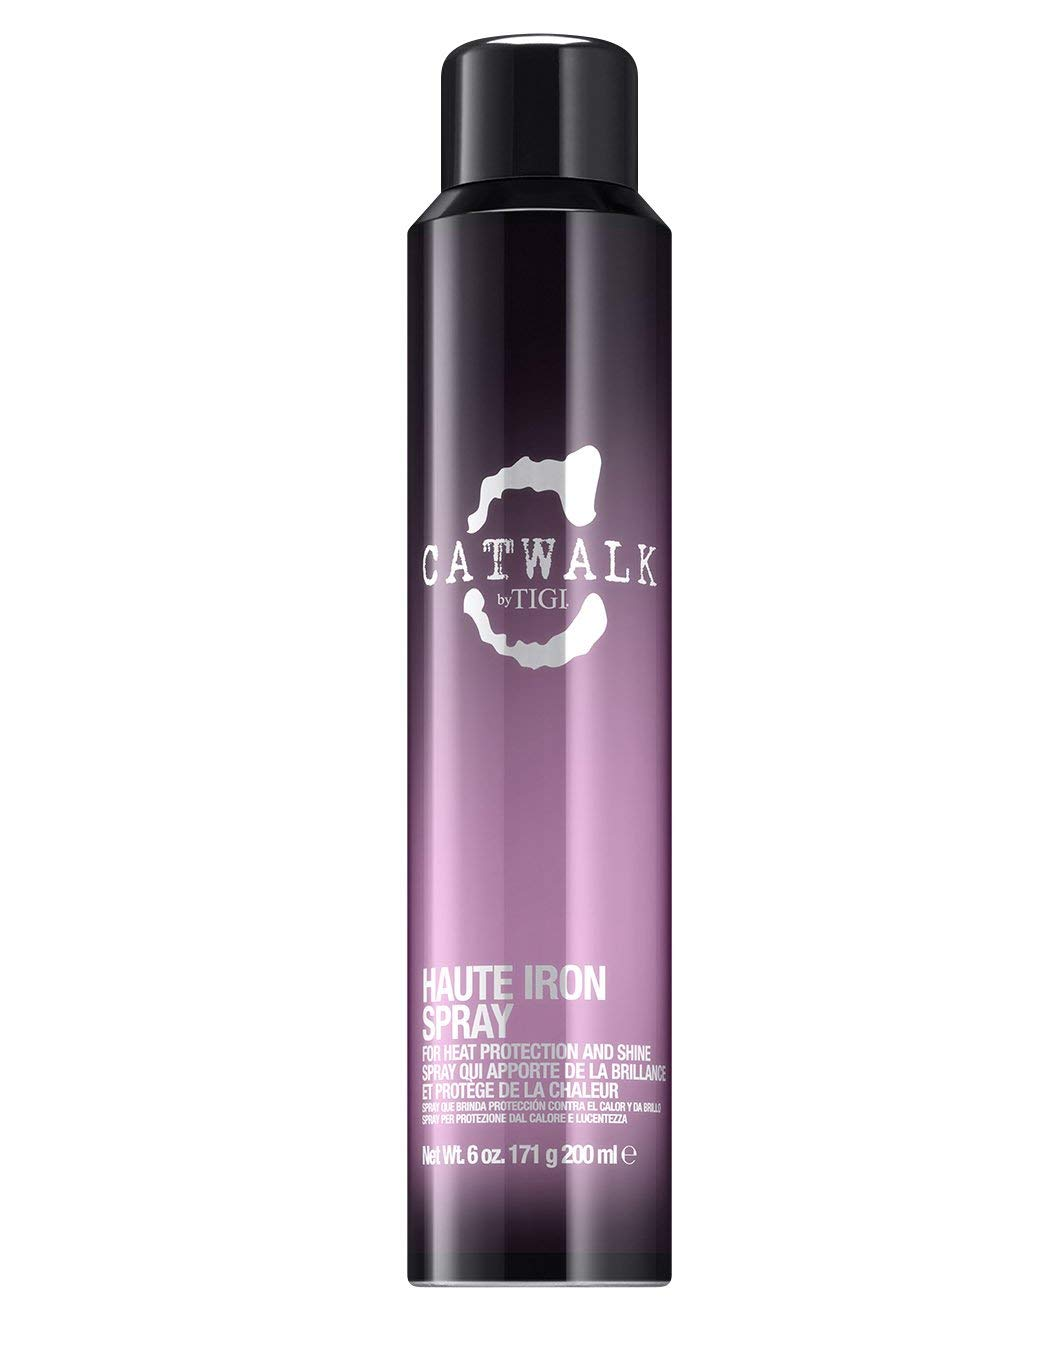 Catwalk by Tigi Haute Iron Heat Protectant Spray for Heat Protection 200 ml